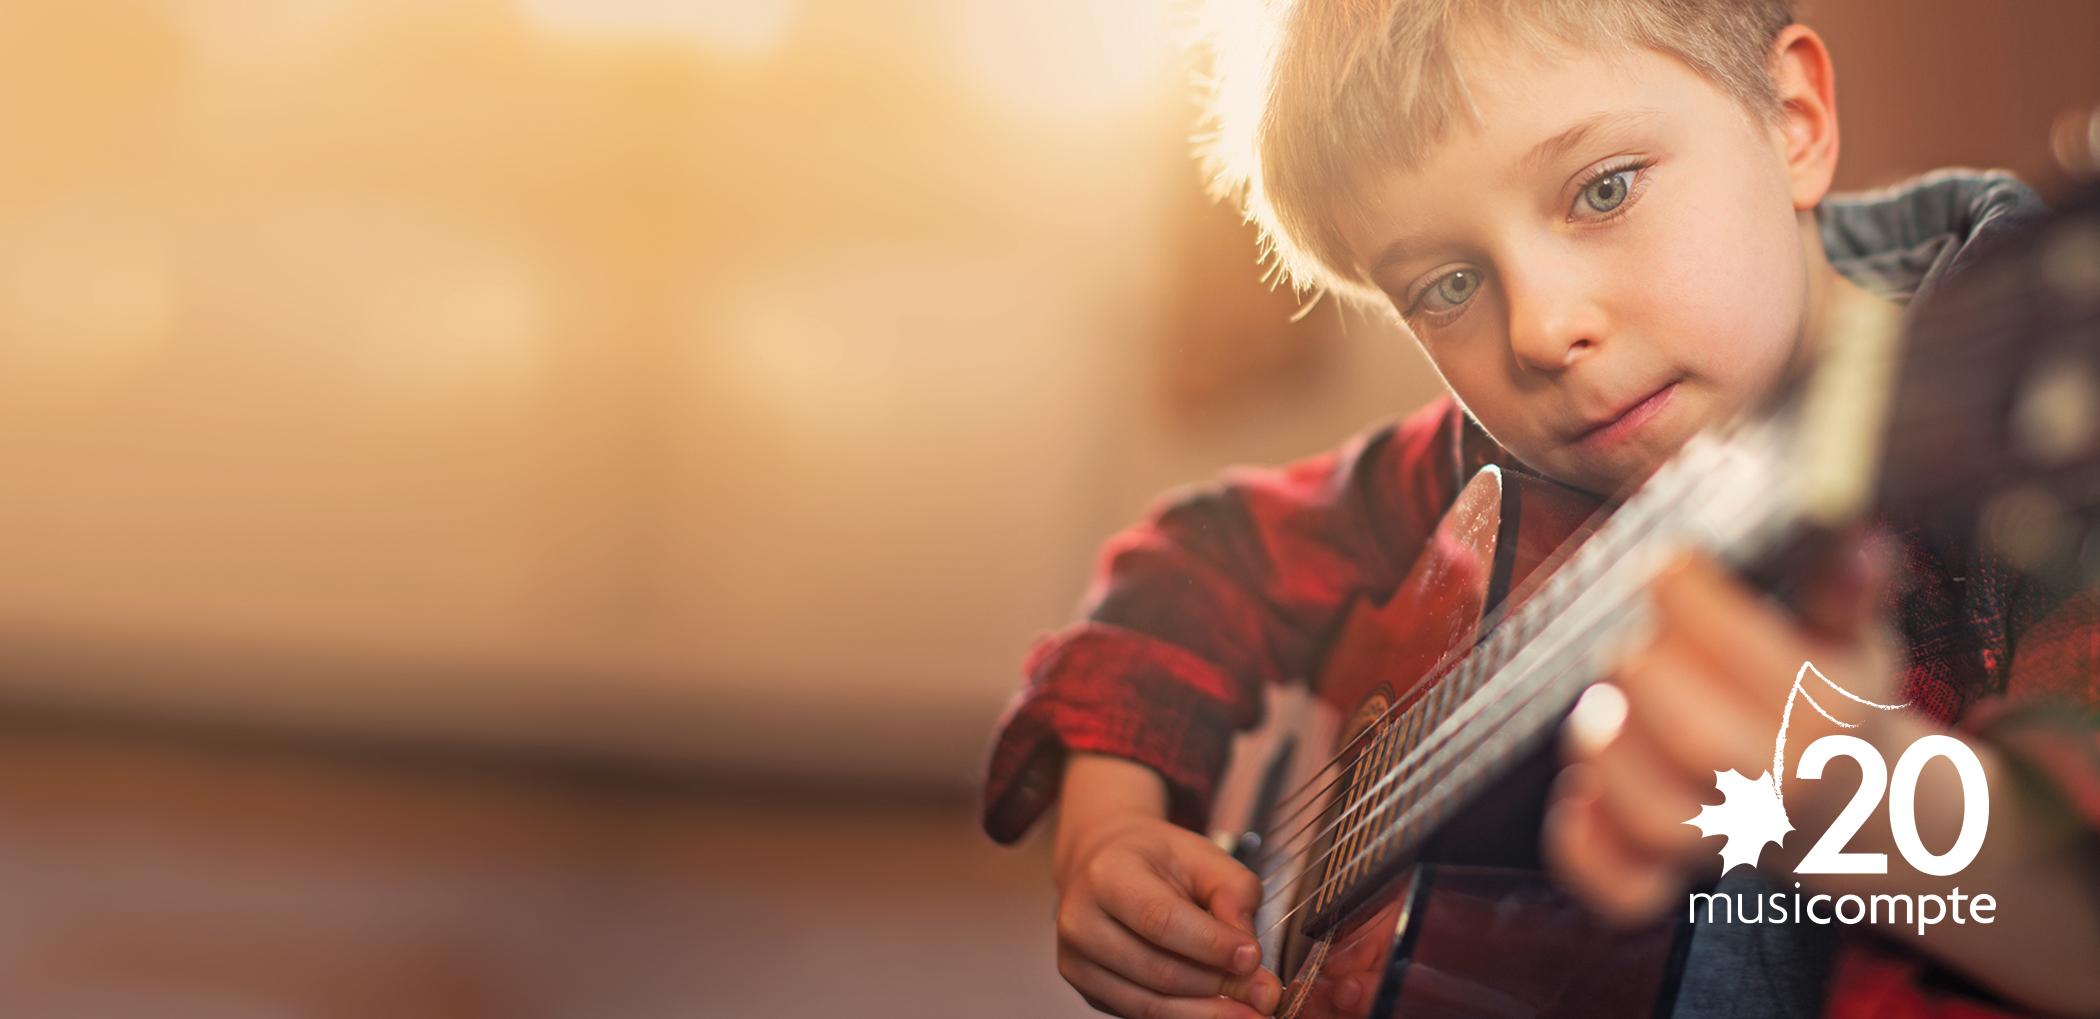 Jeune, Garçon, jouer, guitare